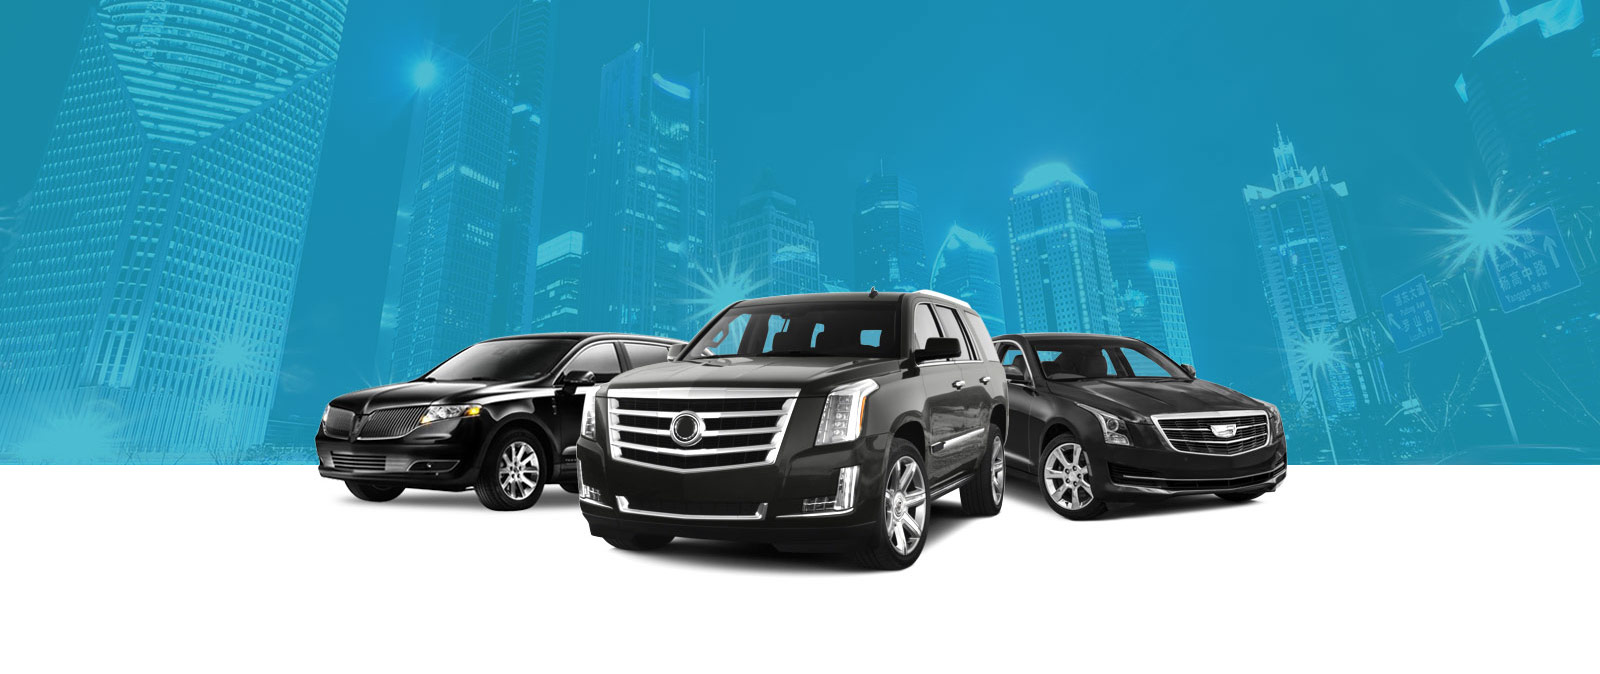 SUV Limo Chicago, Car Service Union Station Chicago, Stretch SUV Limousine Service, Fleet, All American Limousine, Cadillac Escalade, Book Limo